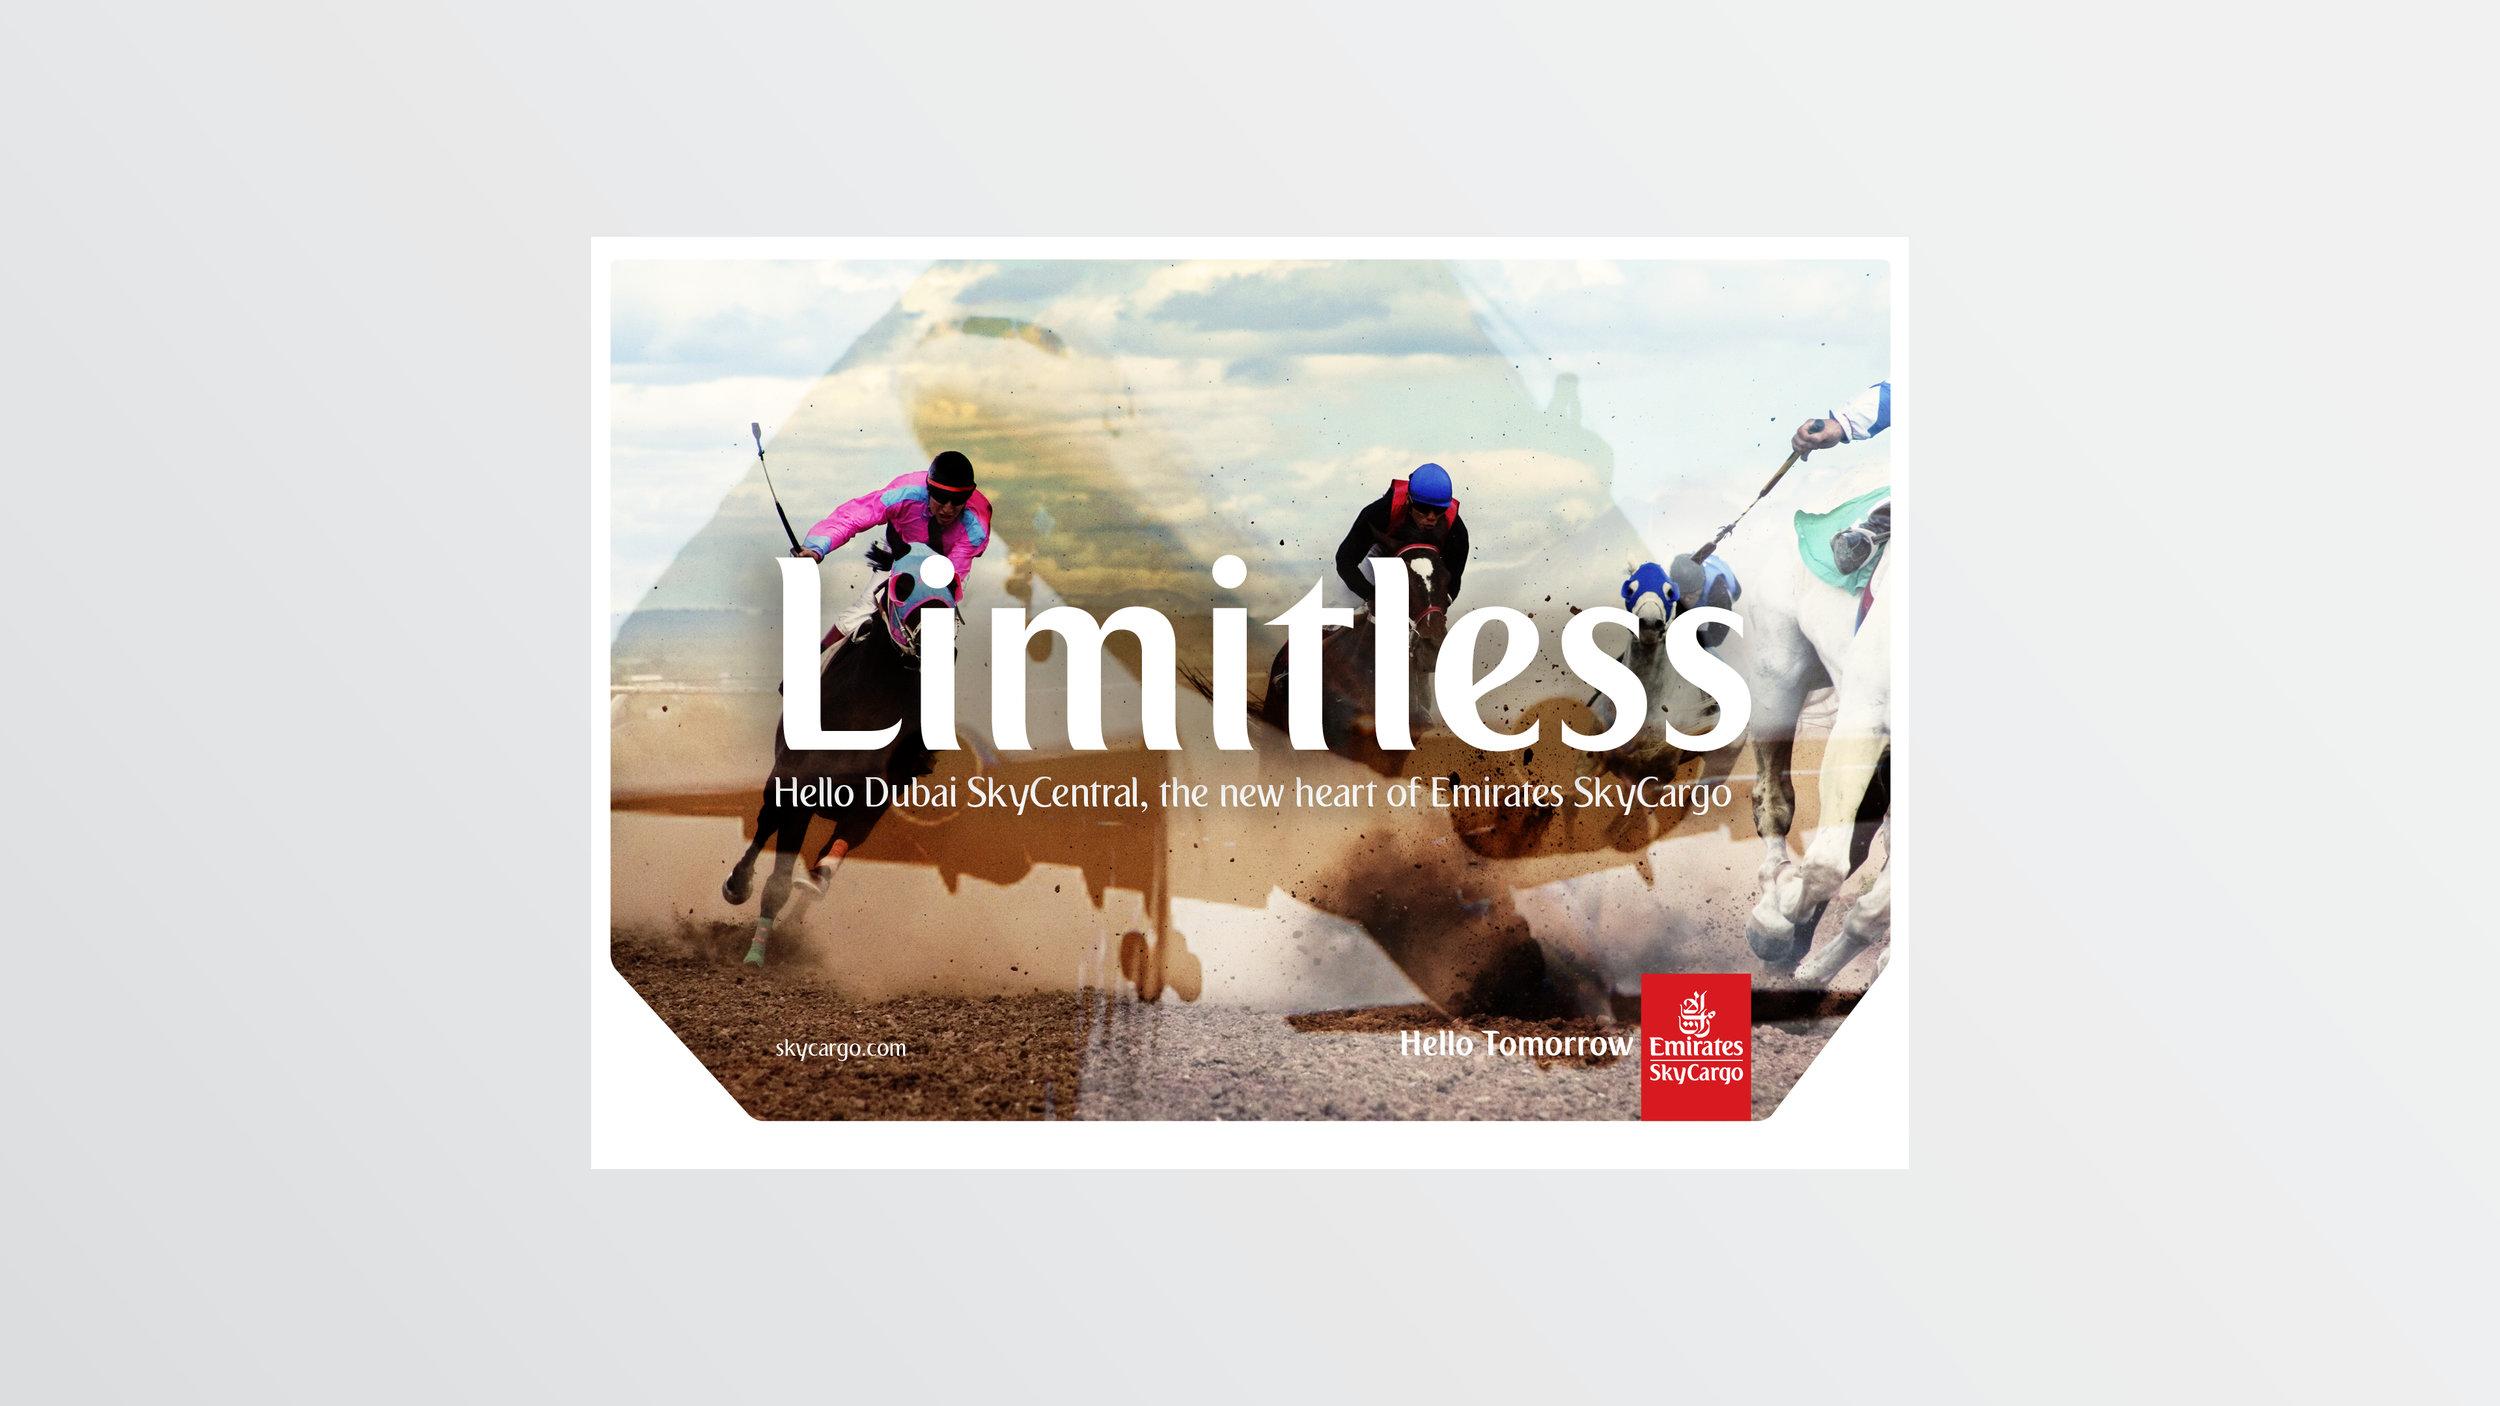 EMIRATES_3840x21605.jpg